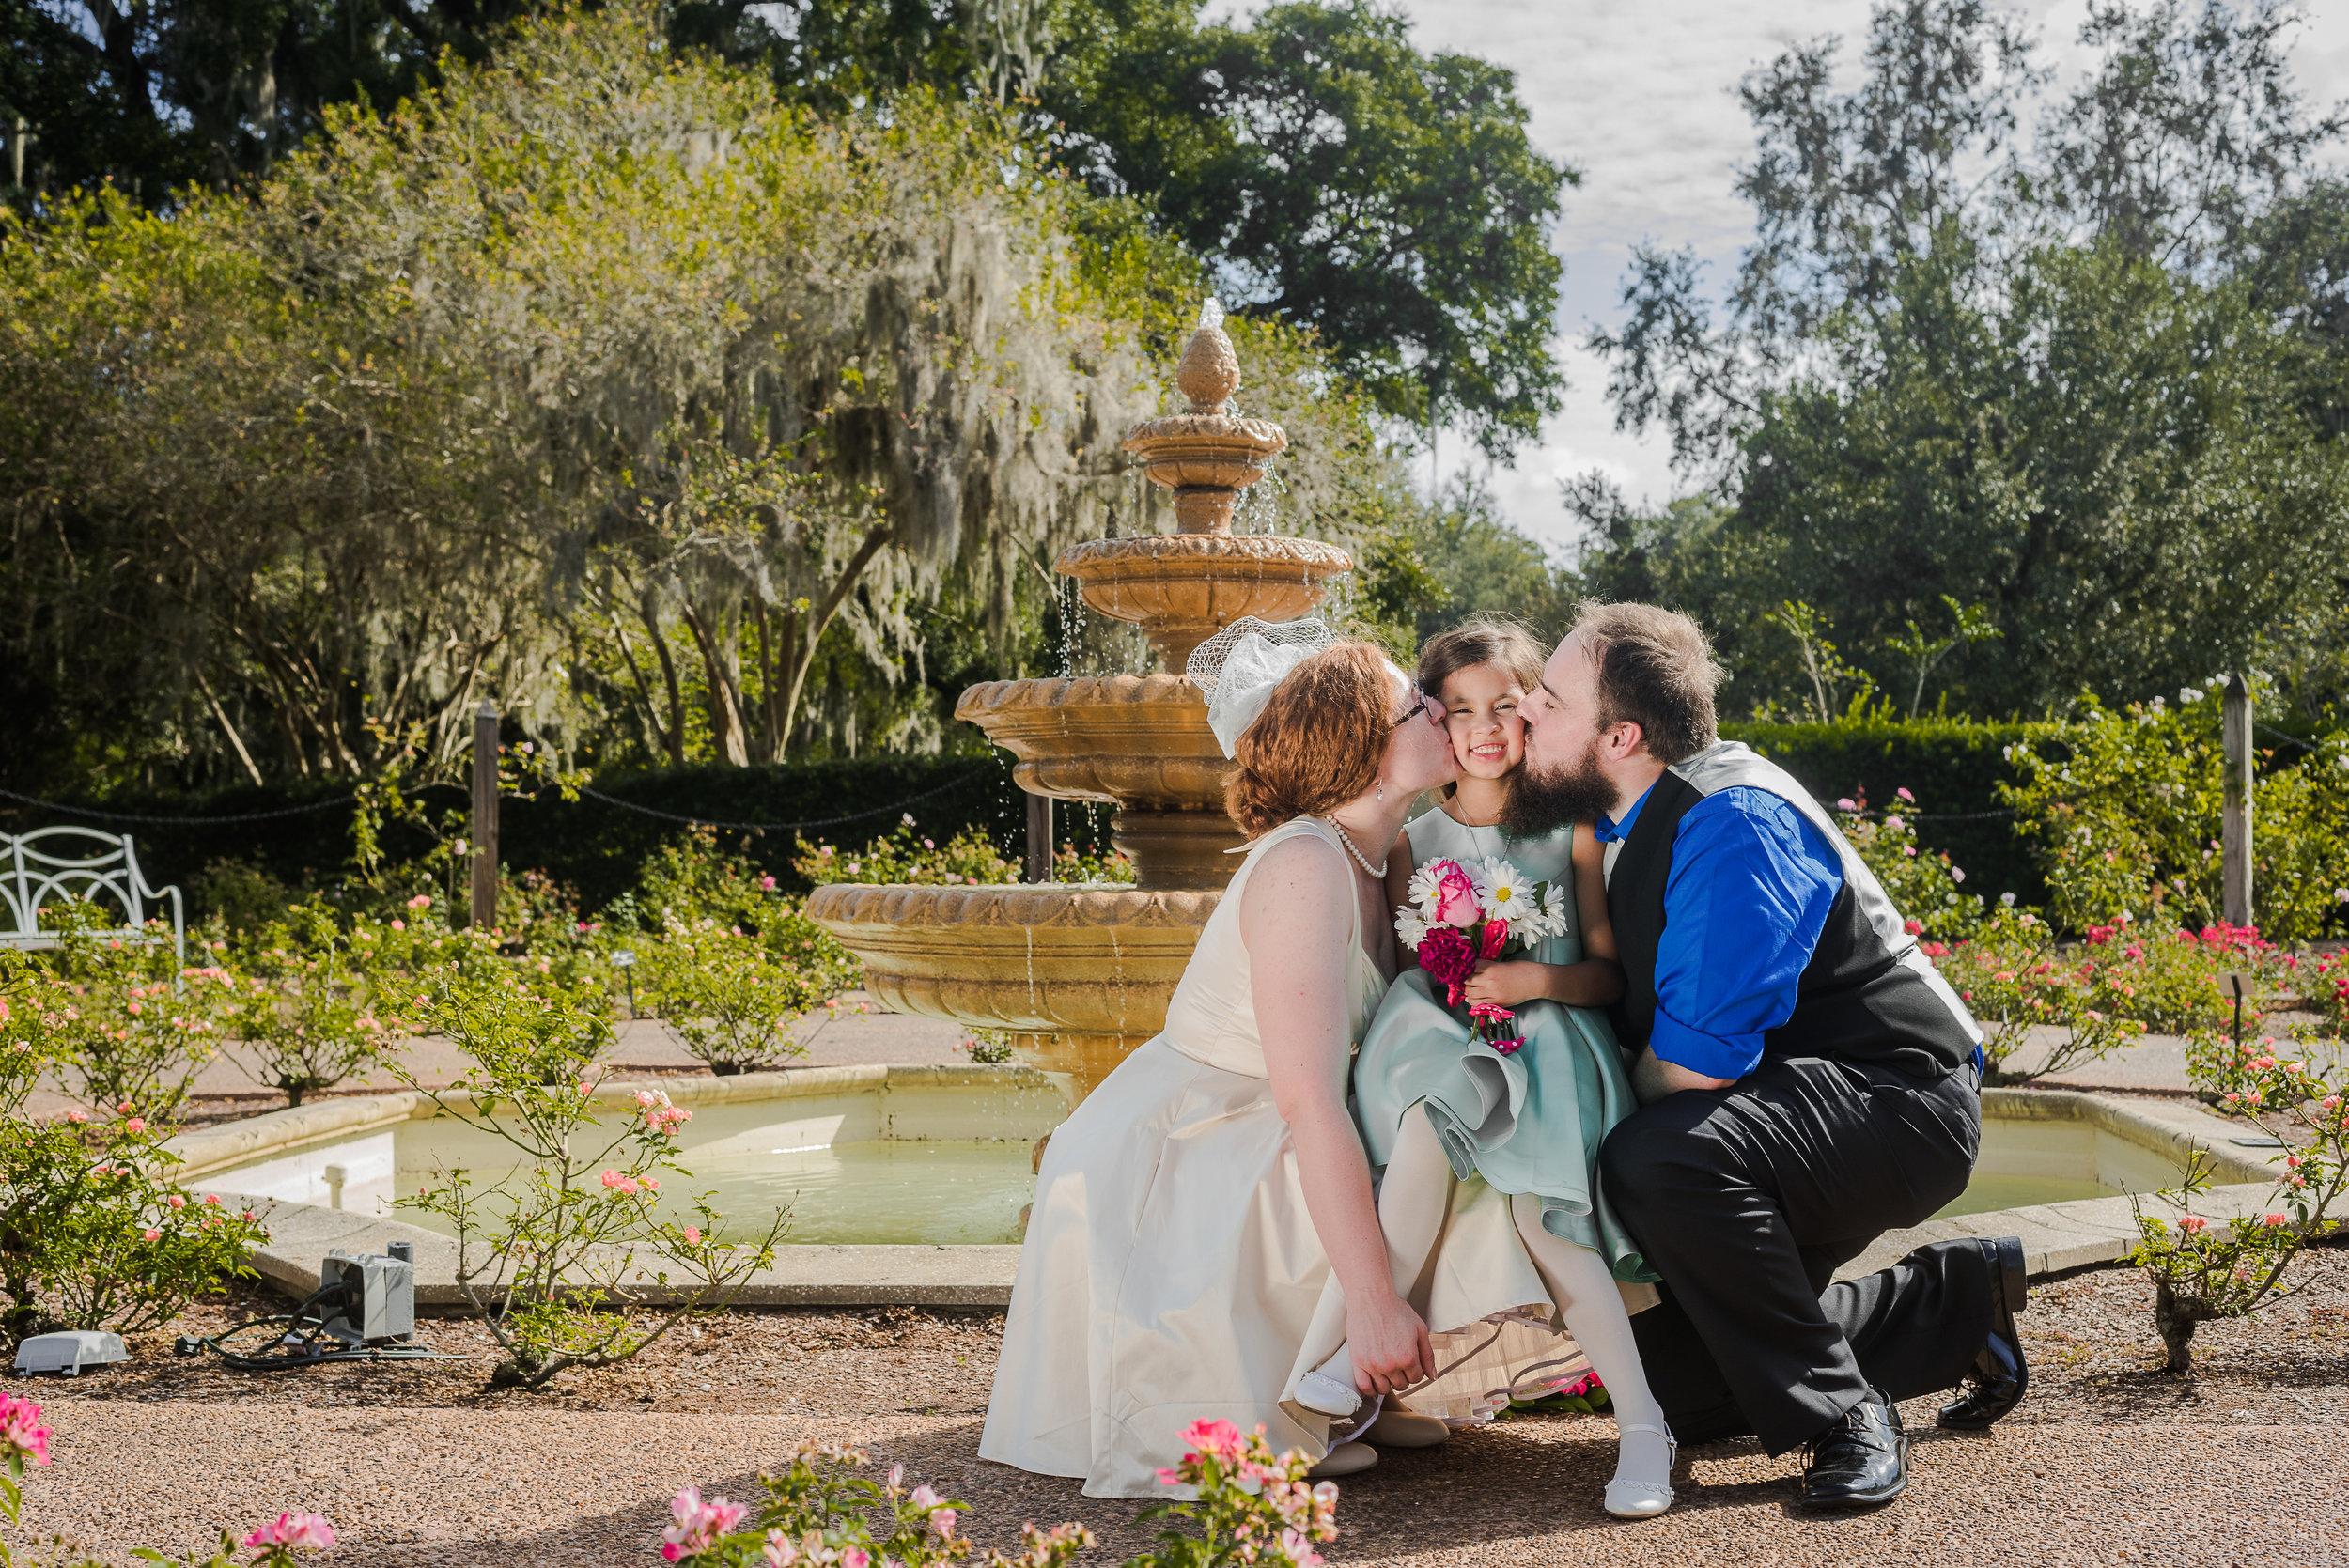 herry-garden-wedding-1-15.jpg